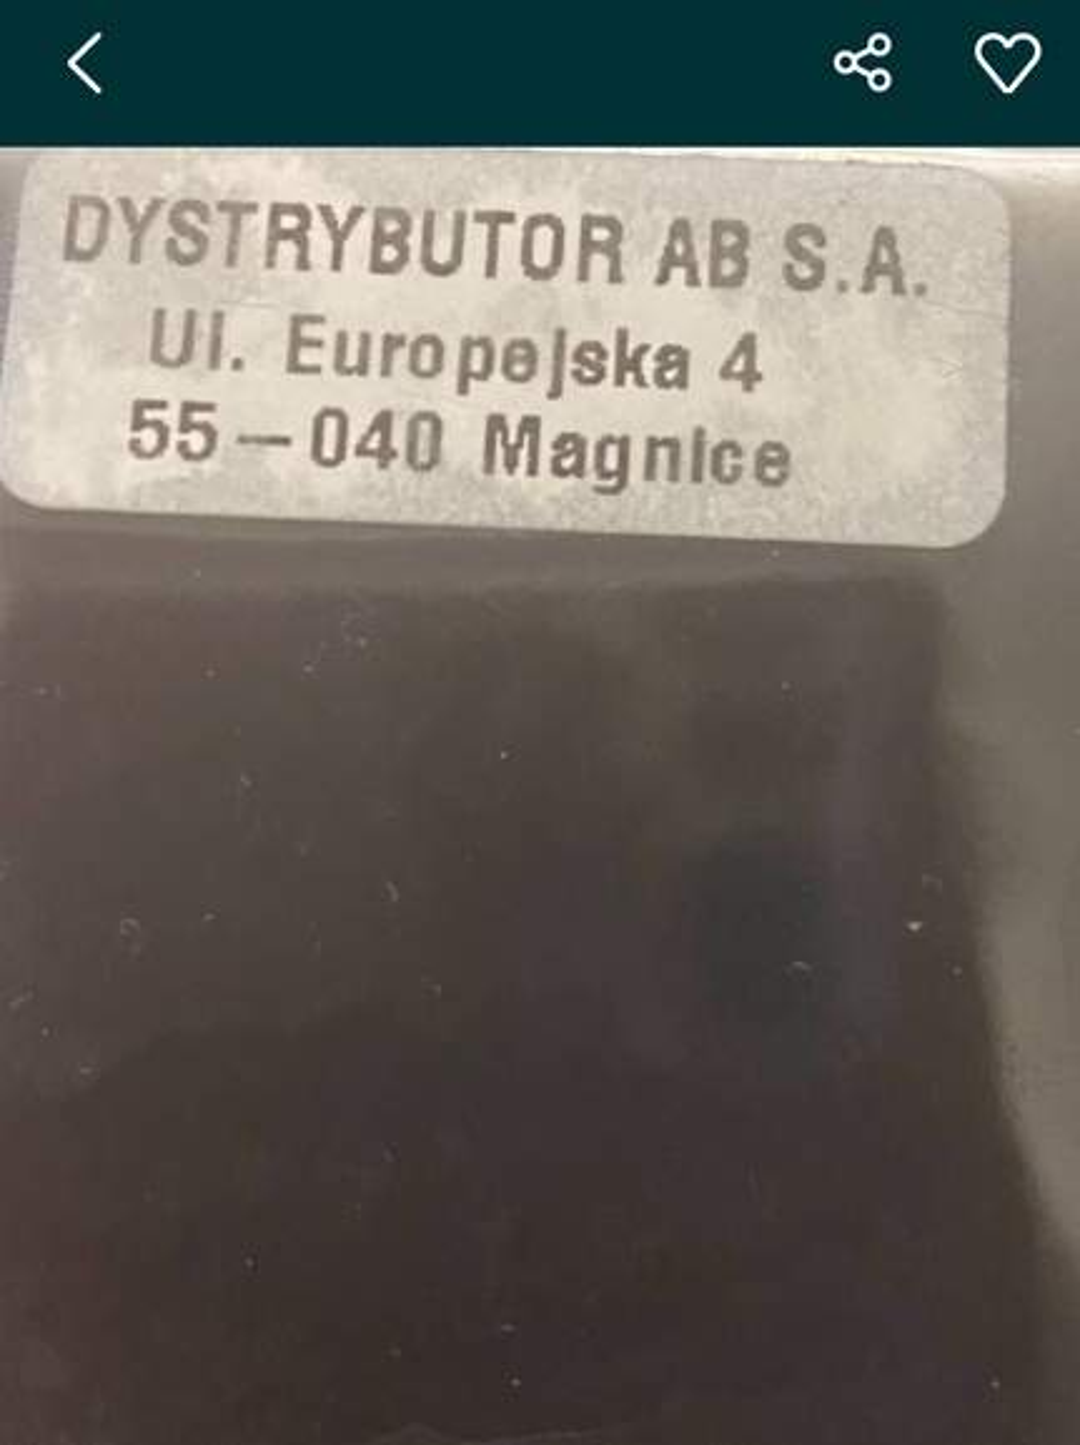 346605-jfD5Q.jpg